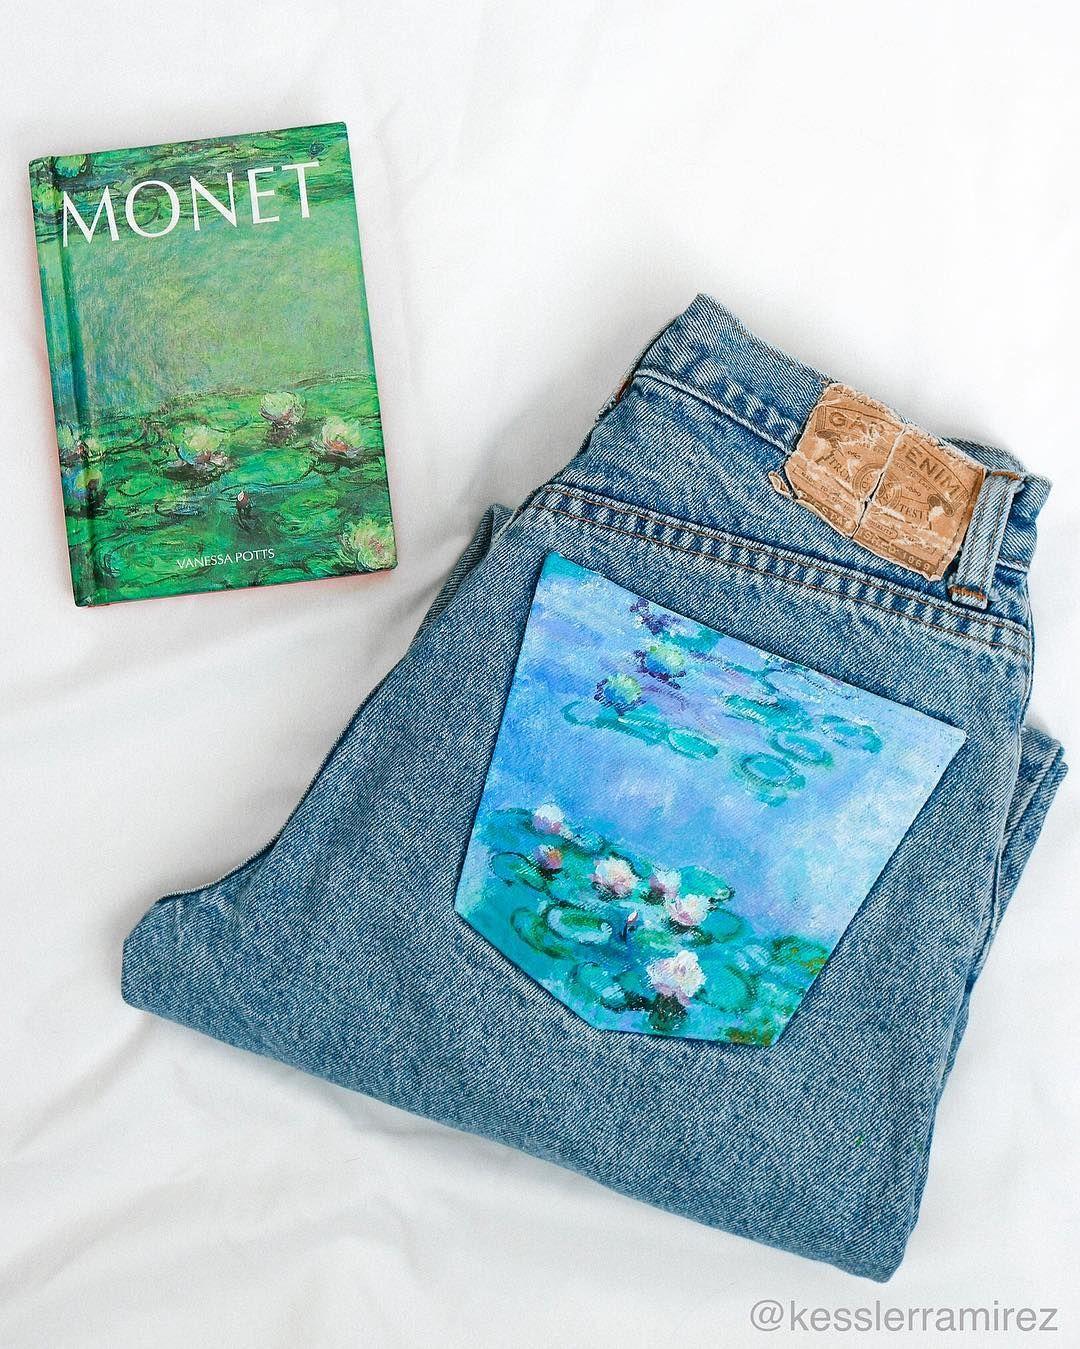 Claude Monet Water Lilies Painting By Kessler Ramirez Art